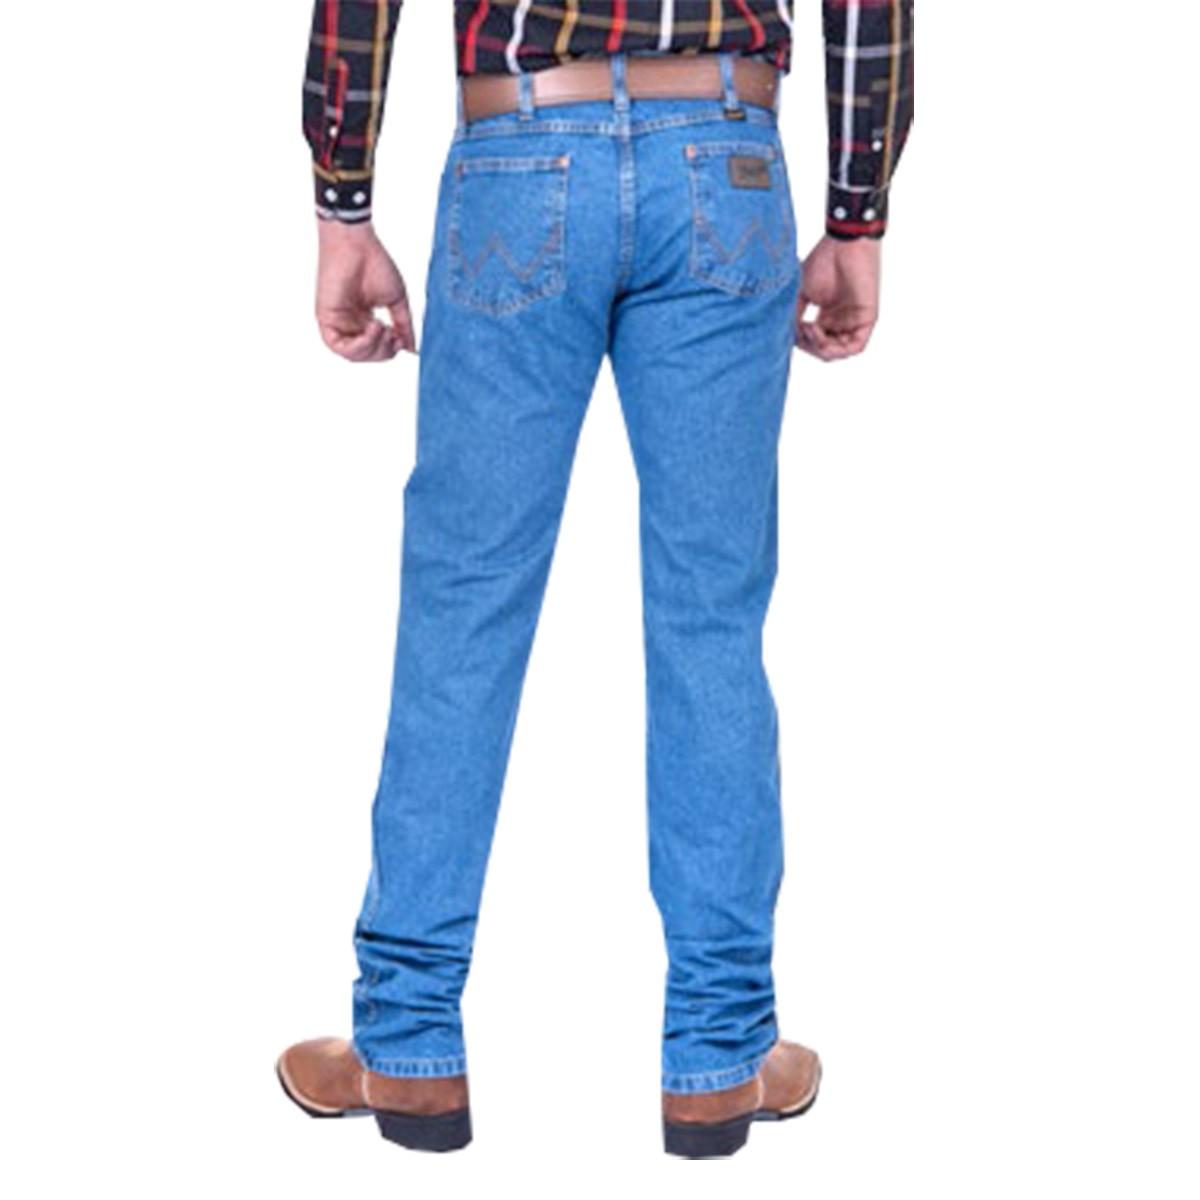 Calça Wrangler Nacional Masculina Jeans 13MWZGK36